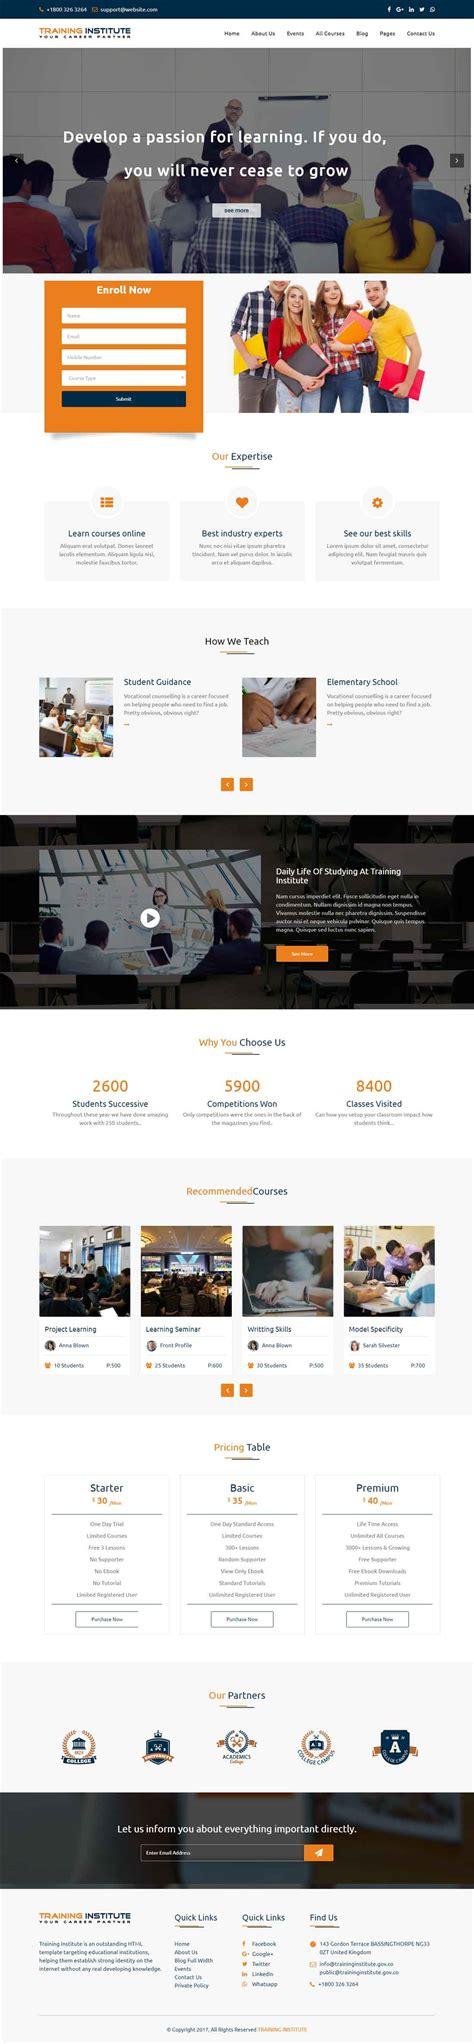 theme for education seminar education training institute wordpress theme for school